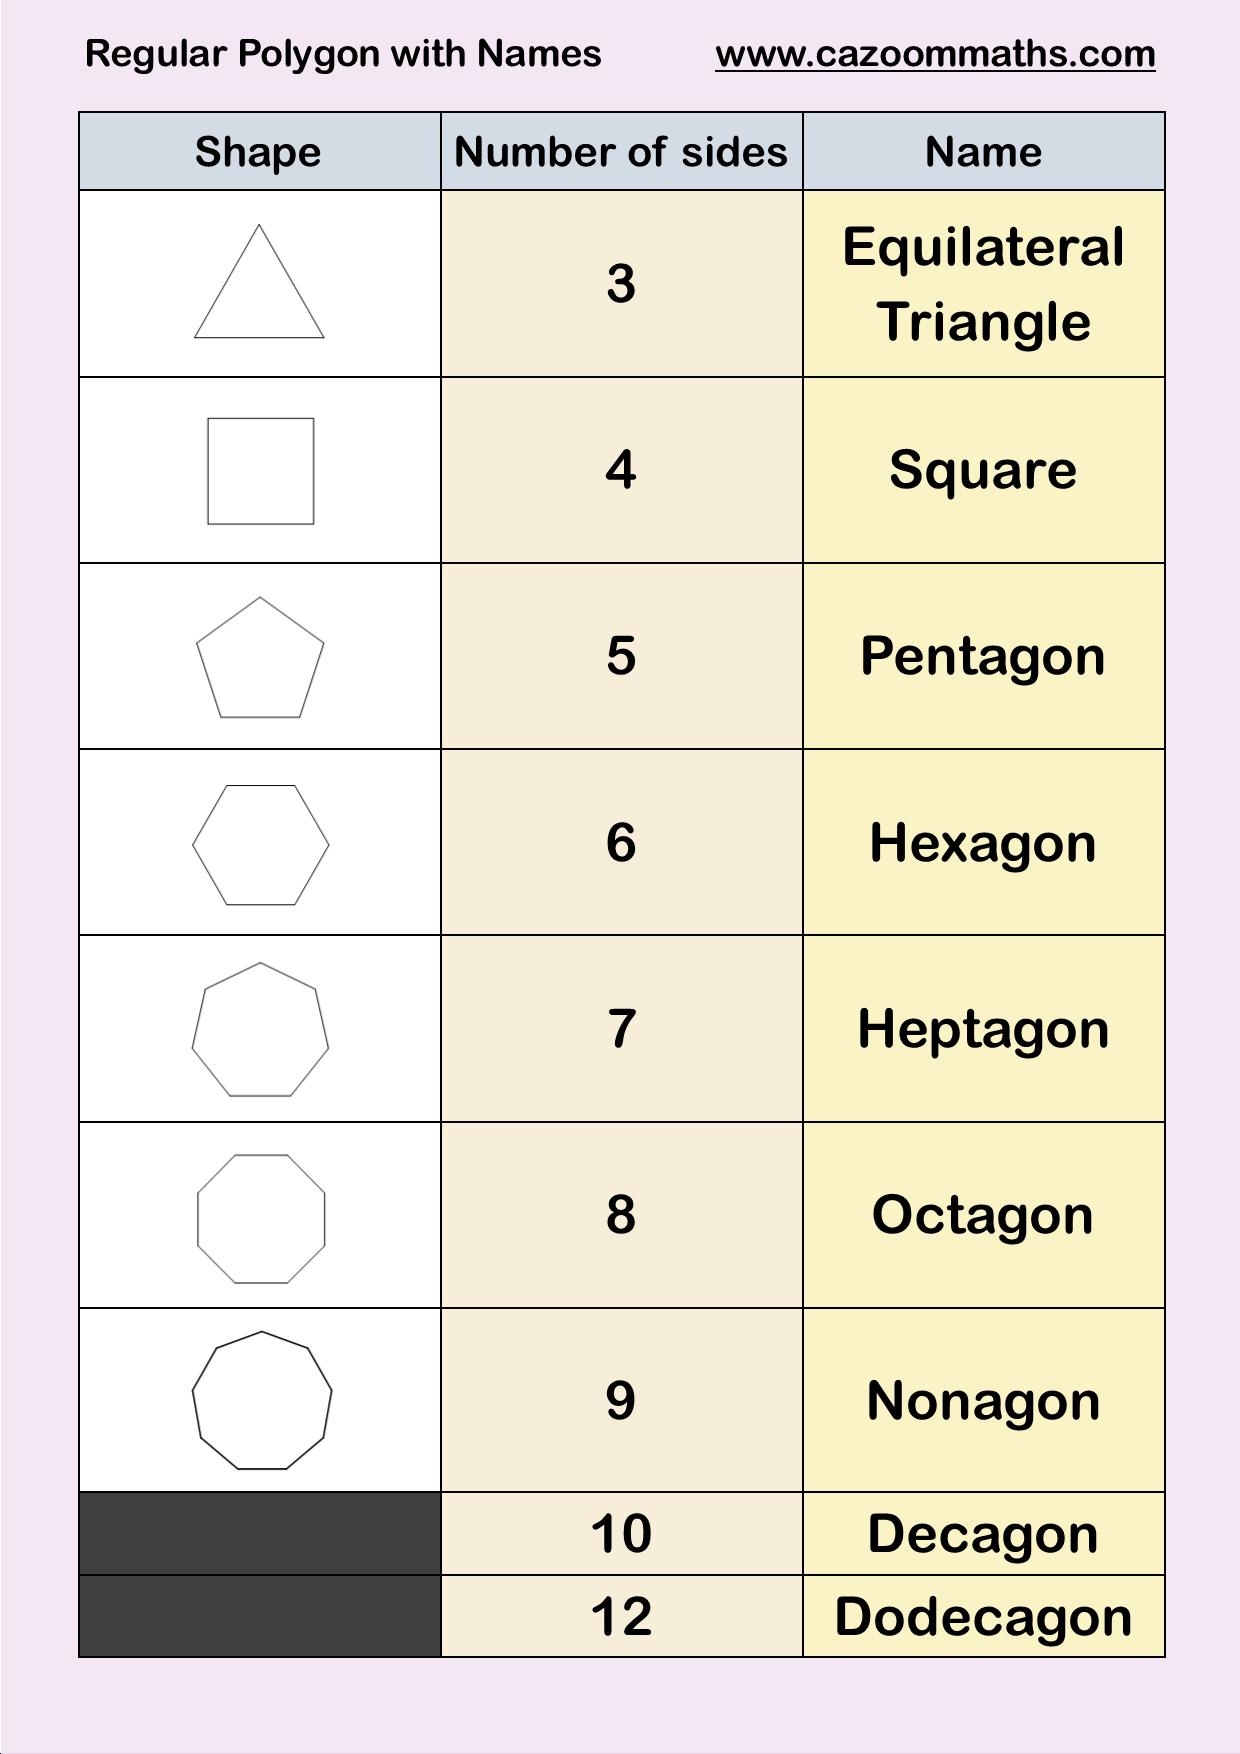 Regular Polygons with Names – Naming Polygons Worksheet